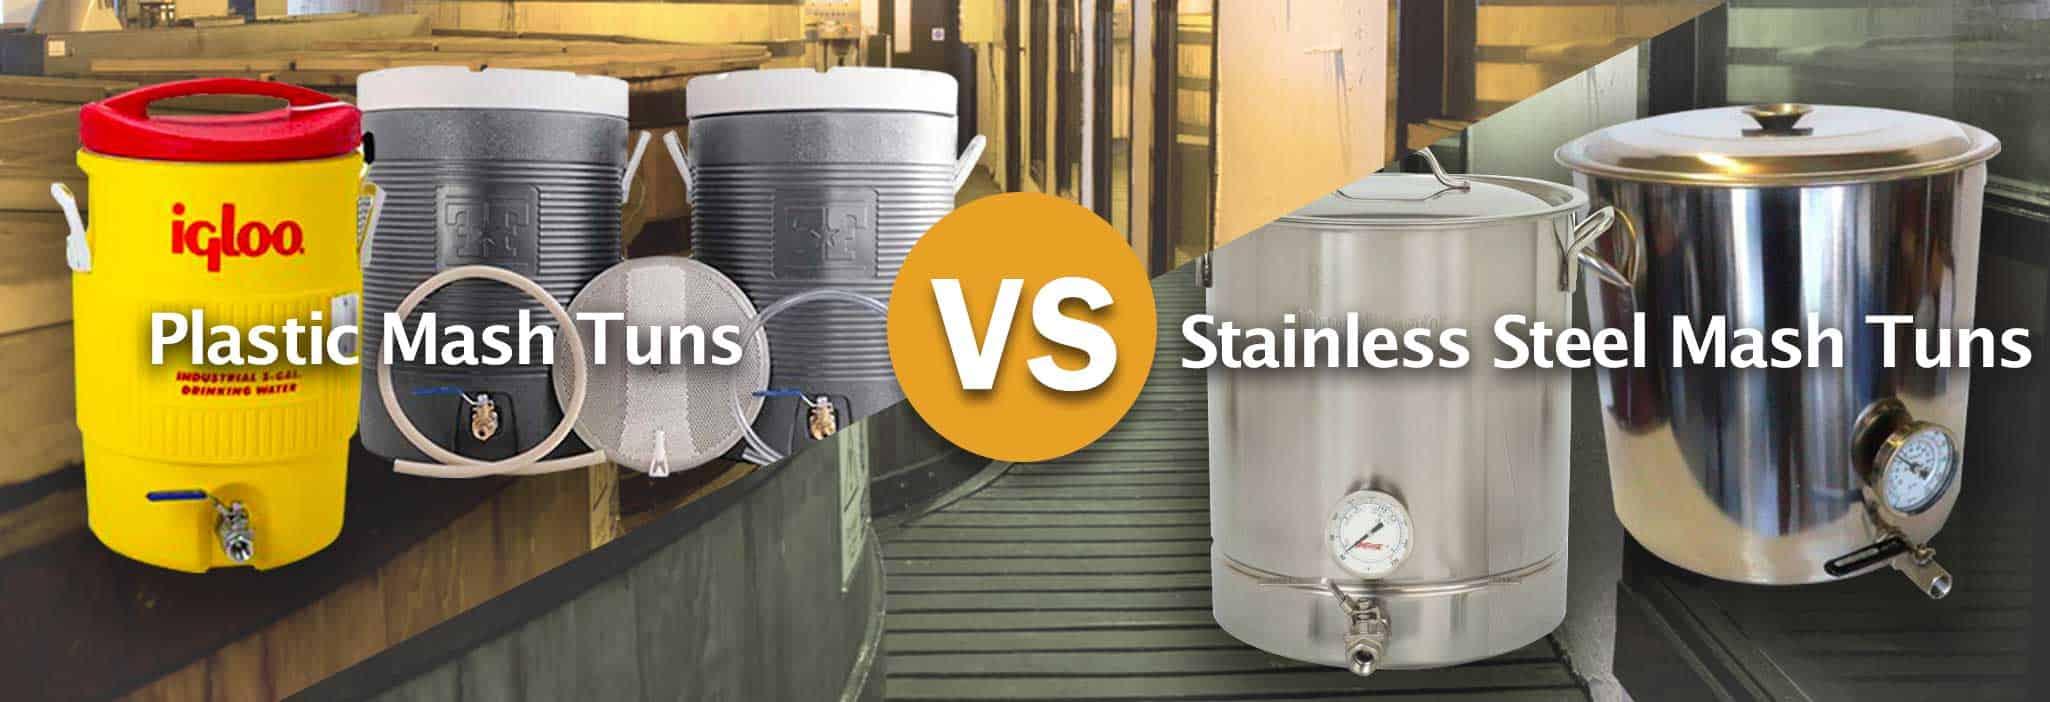 Plastic-Mash-Tuns-vs.-Stainless-Steel-Mash-Tuns